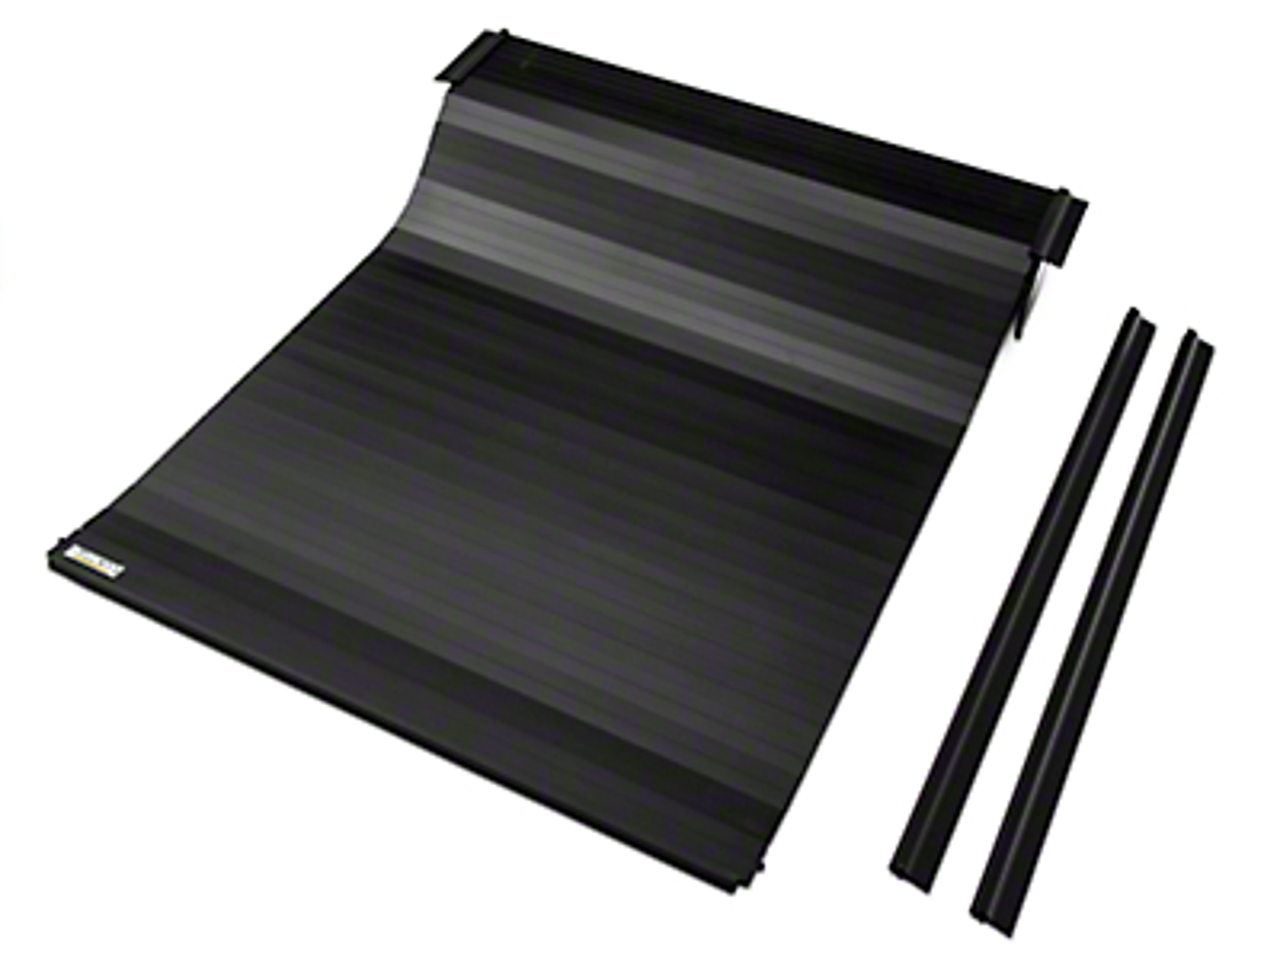 Barricade Retractable Bed Cover (07-13 Sierra 1500 w/ Short & Standard Box)